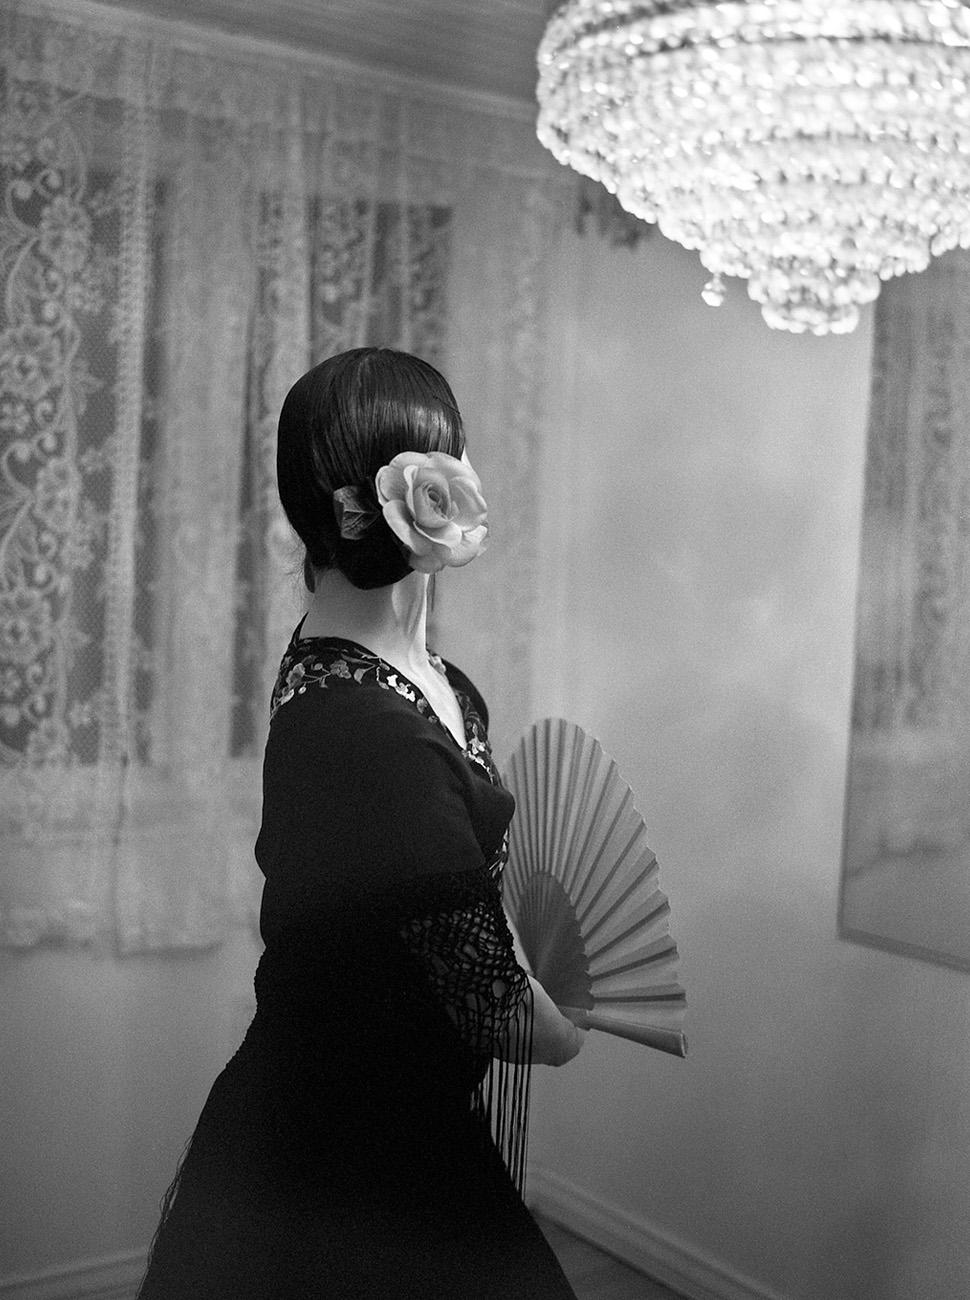 LiehSugai_Dancer_18.jpg